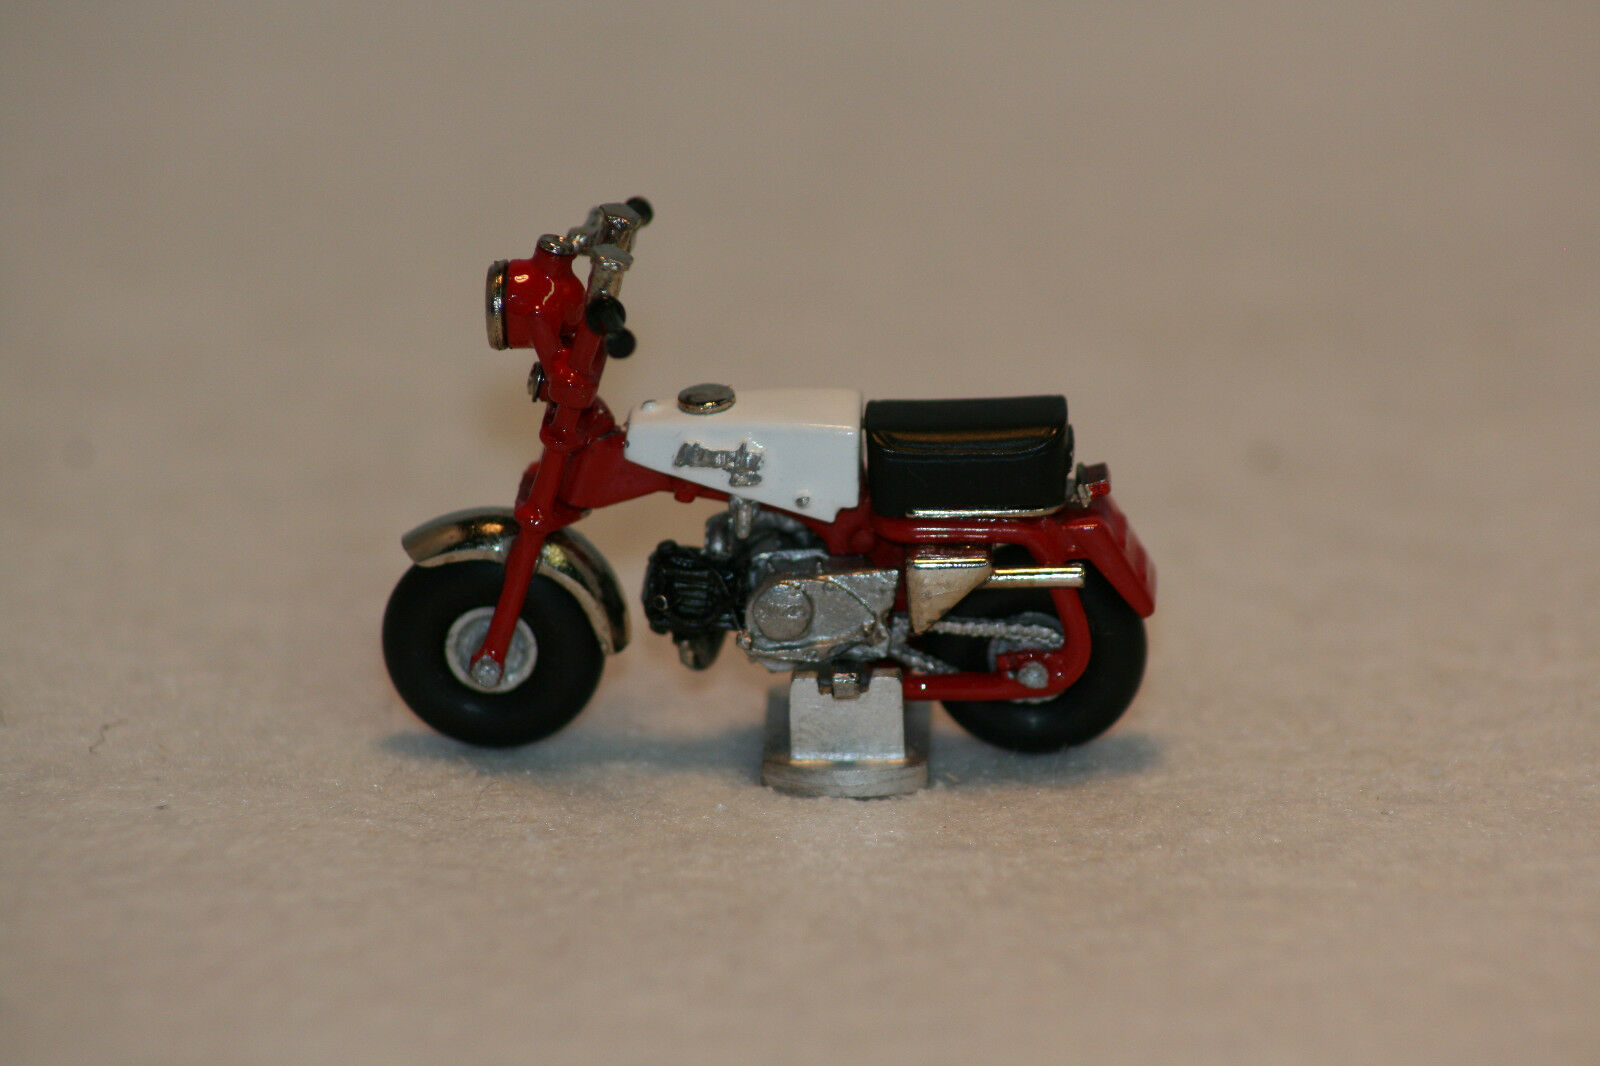 Recollections échelle 1 32, Honda Z100 Monkey Bike. Rouge Blanc. Entièrement NEUF dans sa boîte